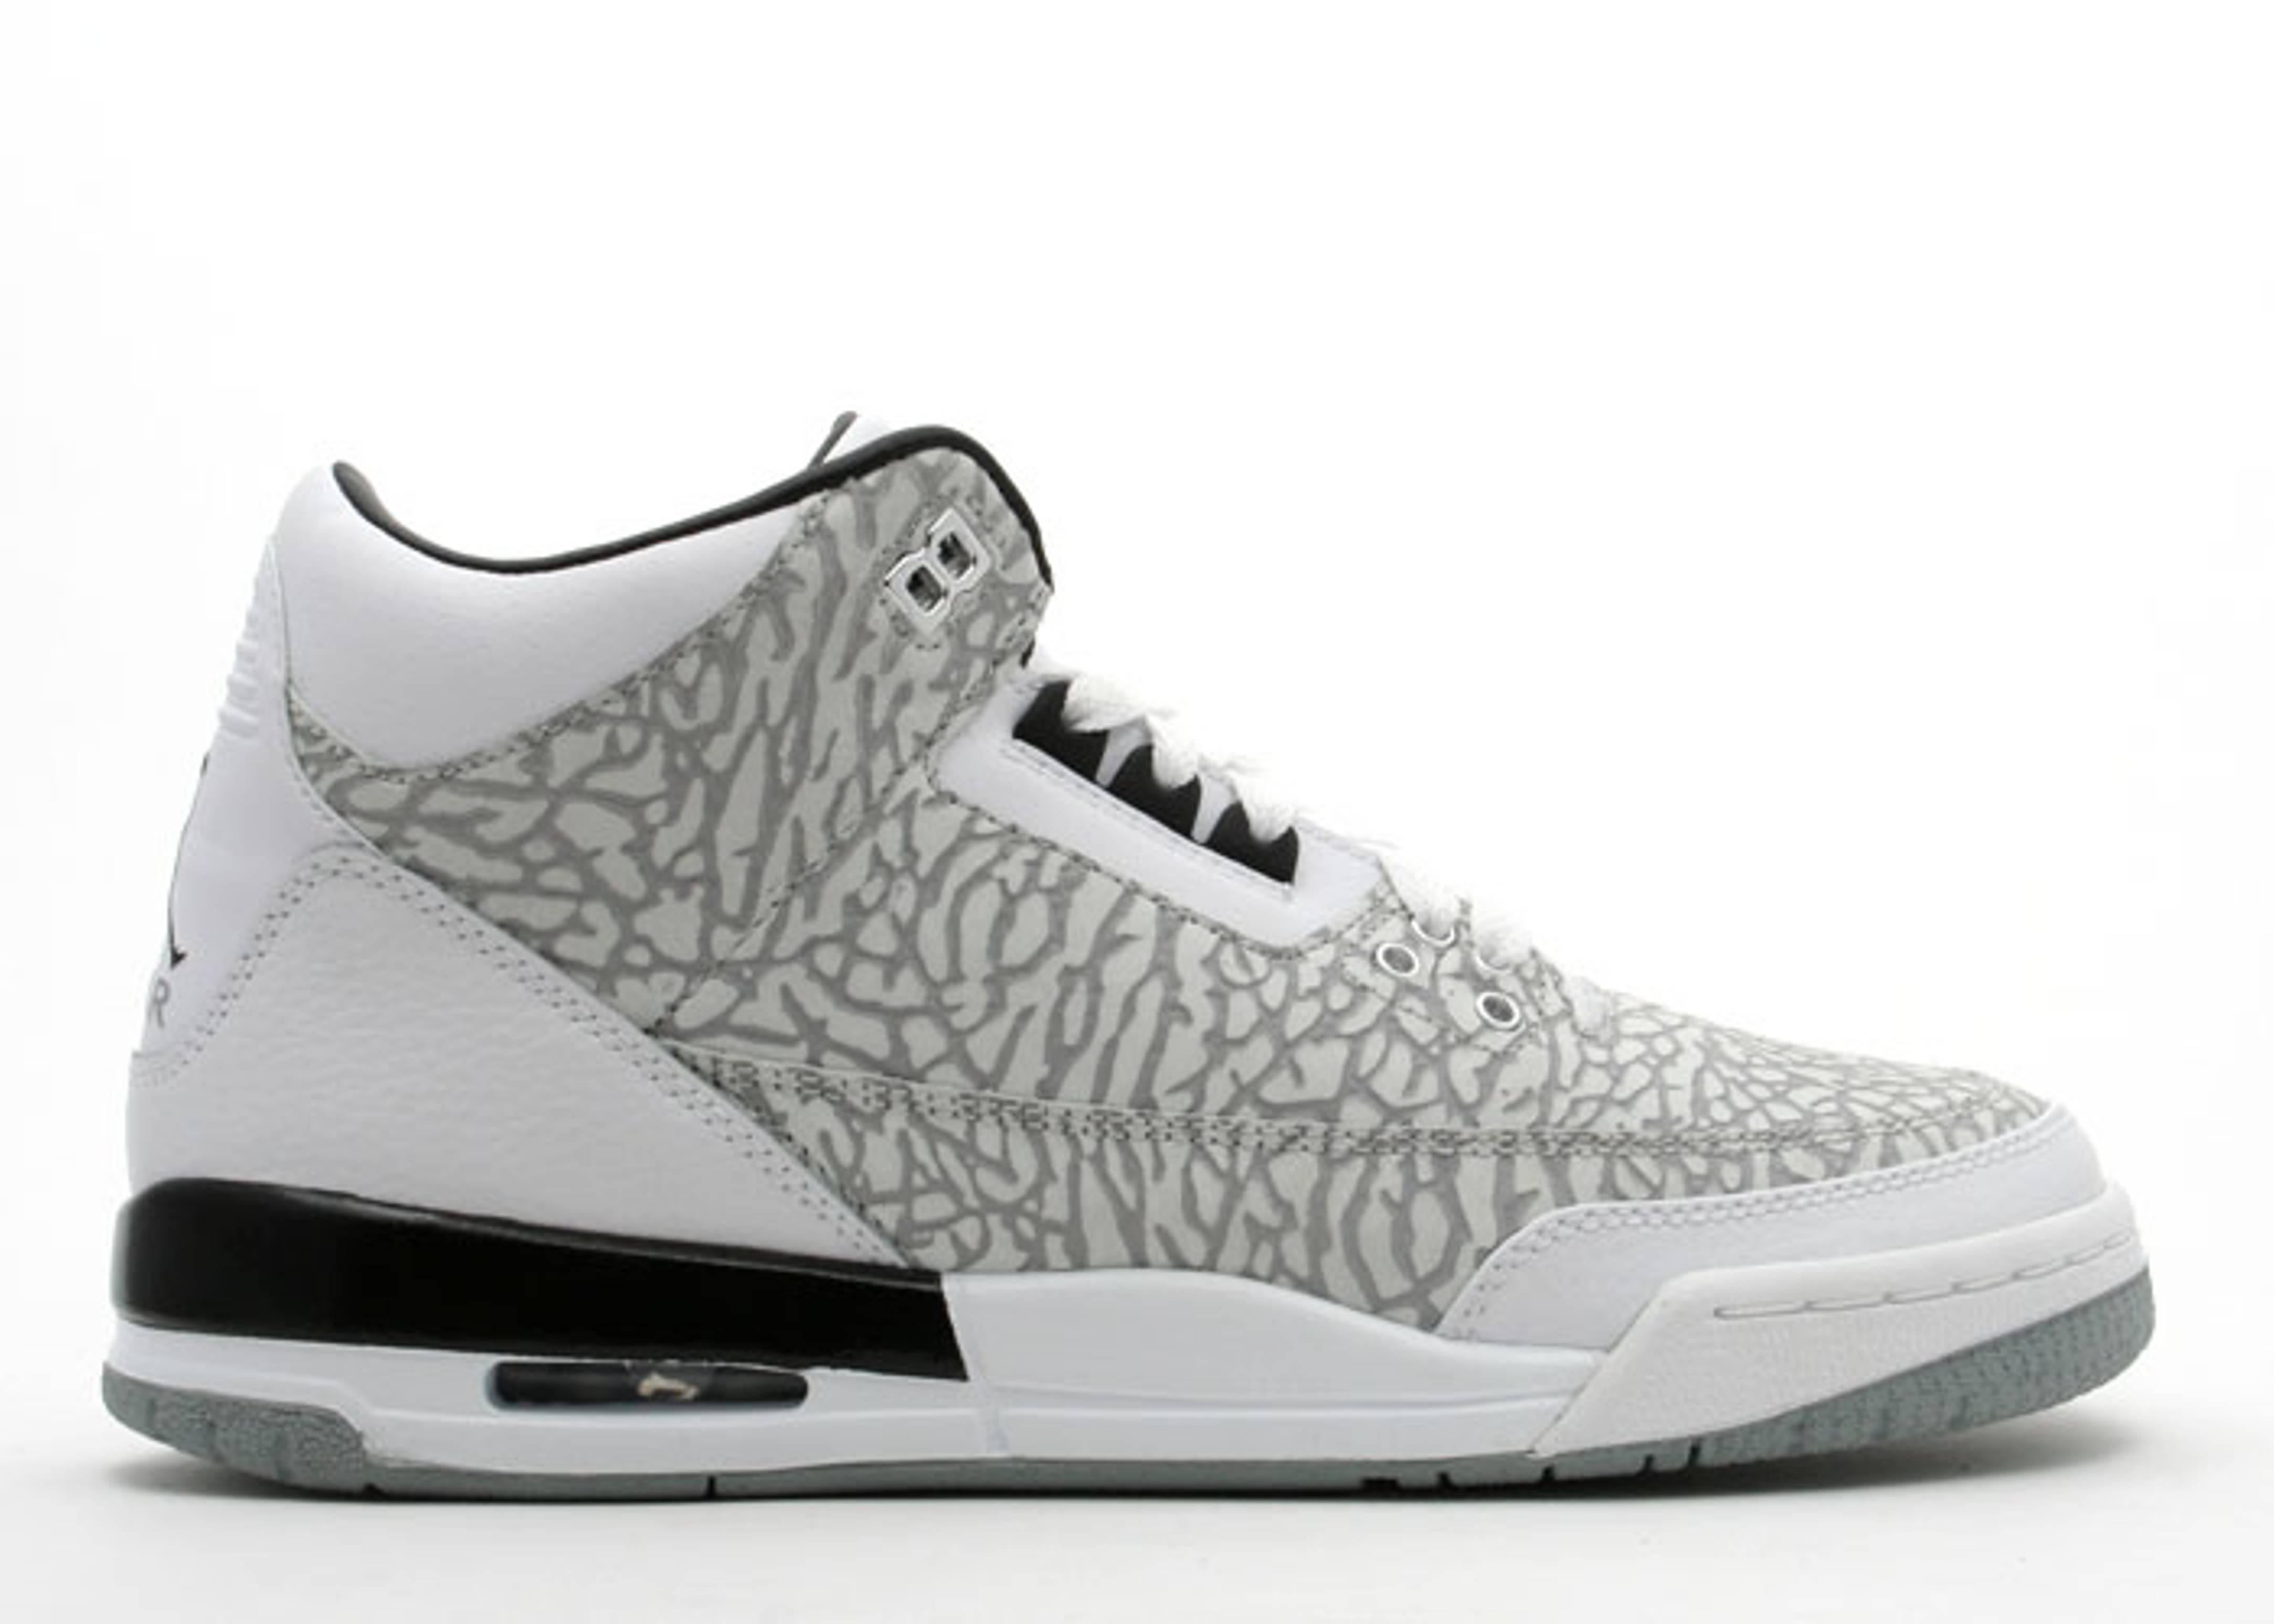 7d4bf352db1ee3 Air Jordan 3 Retro Flip (gs) - Air Jordan - 315768 101 - white ...